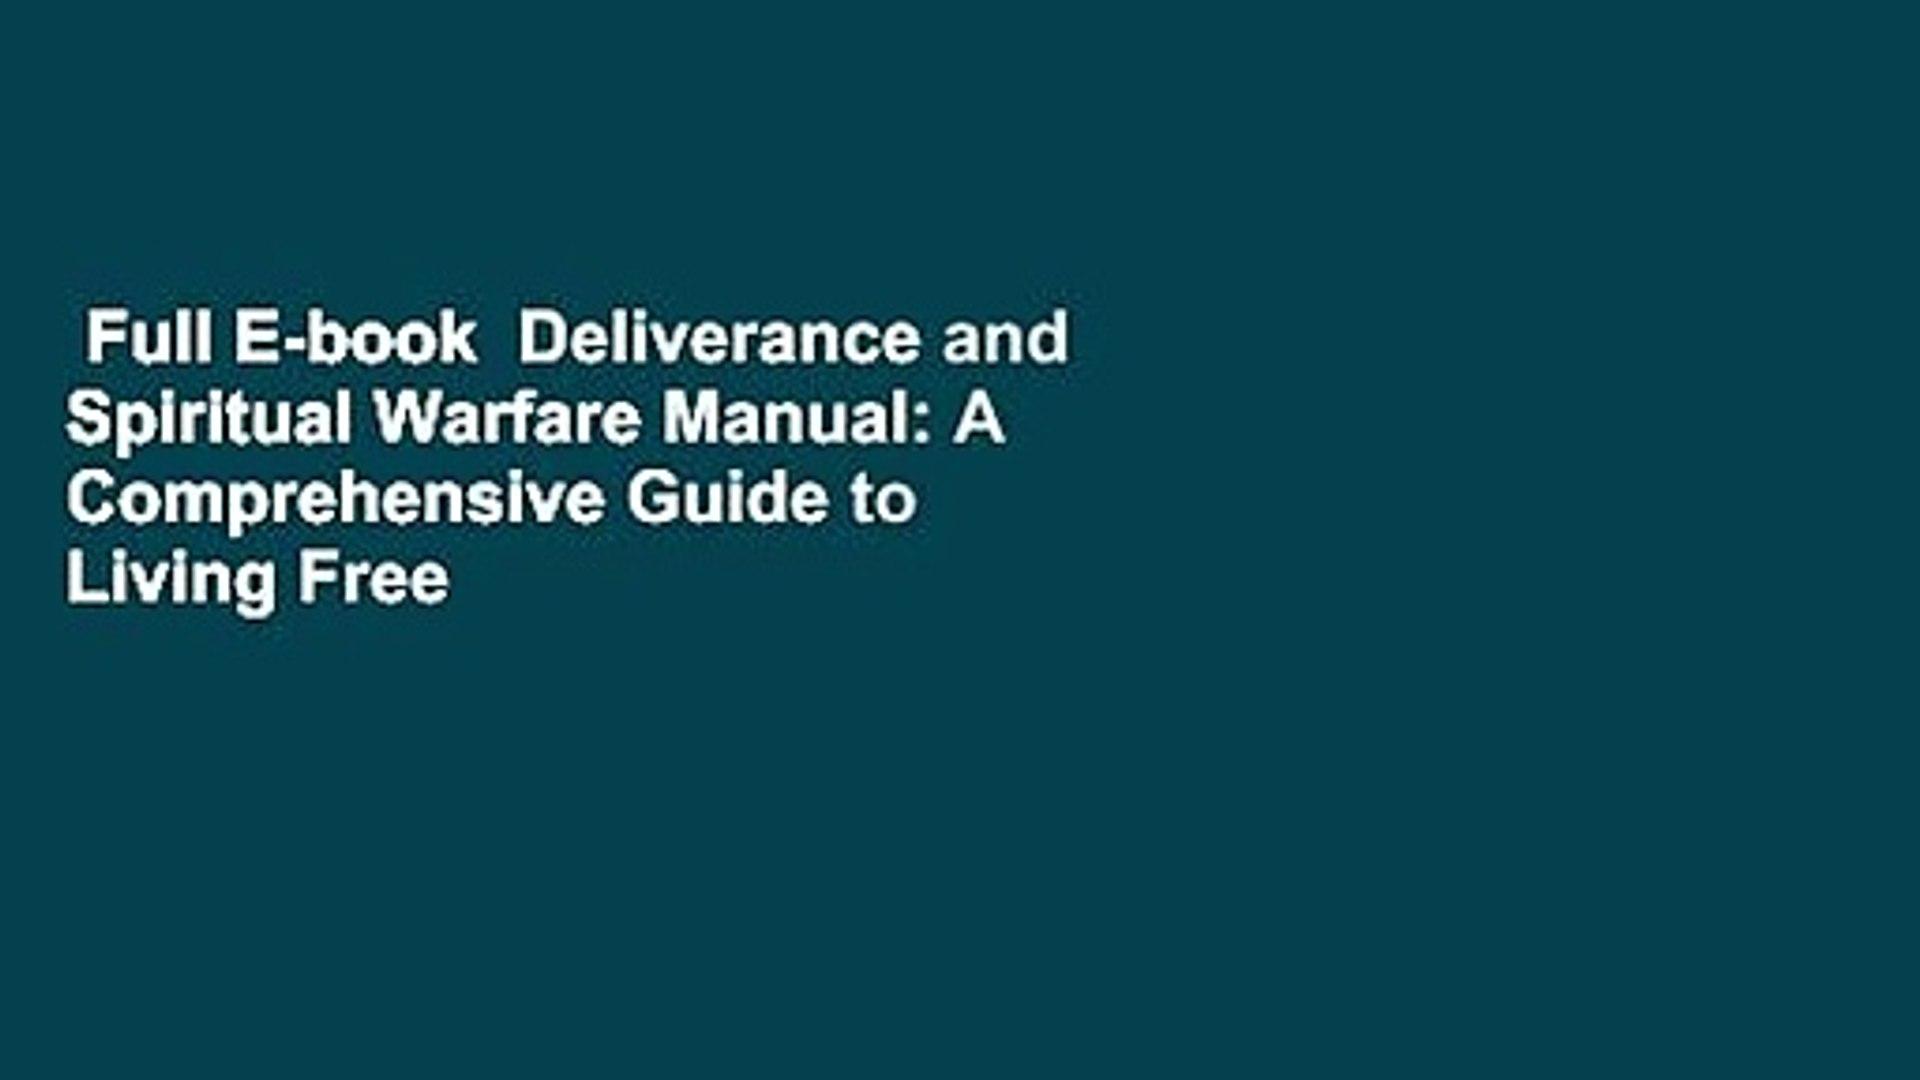 Full E-book  Deliverance and Spiritual Warfare Manual: A Comprehensive Guide to Living Free  For